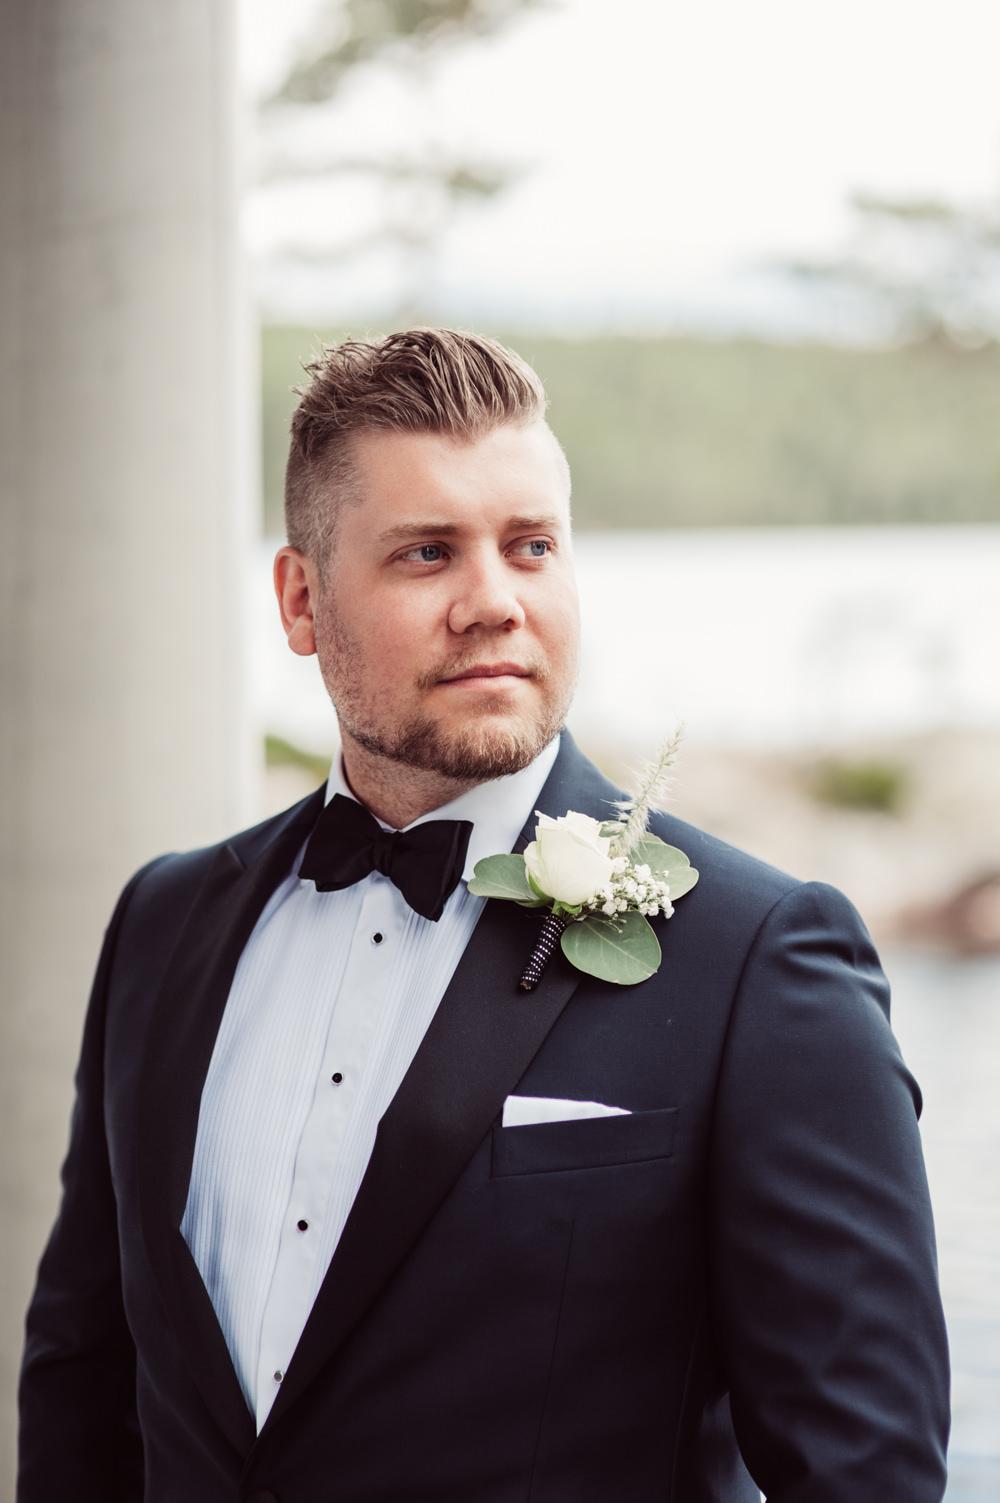 Groom Suit Tux Bow Tie Norway Wedding Maximilian Photography